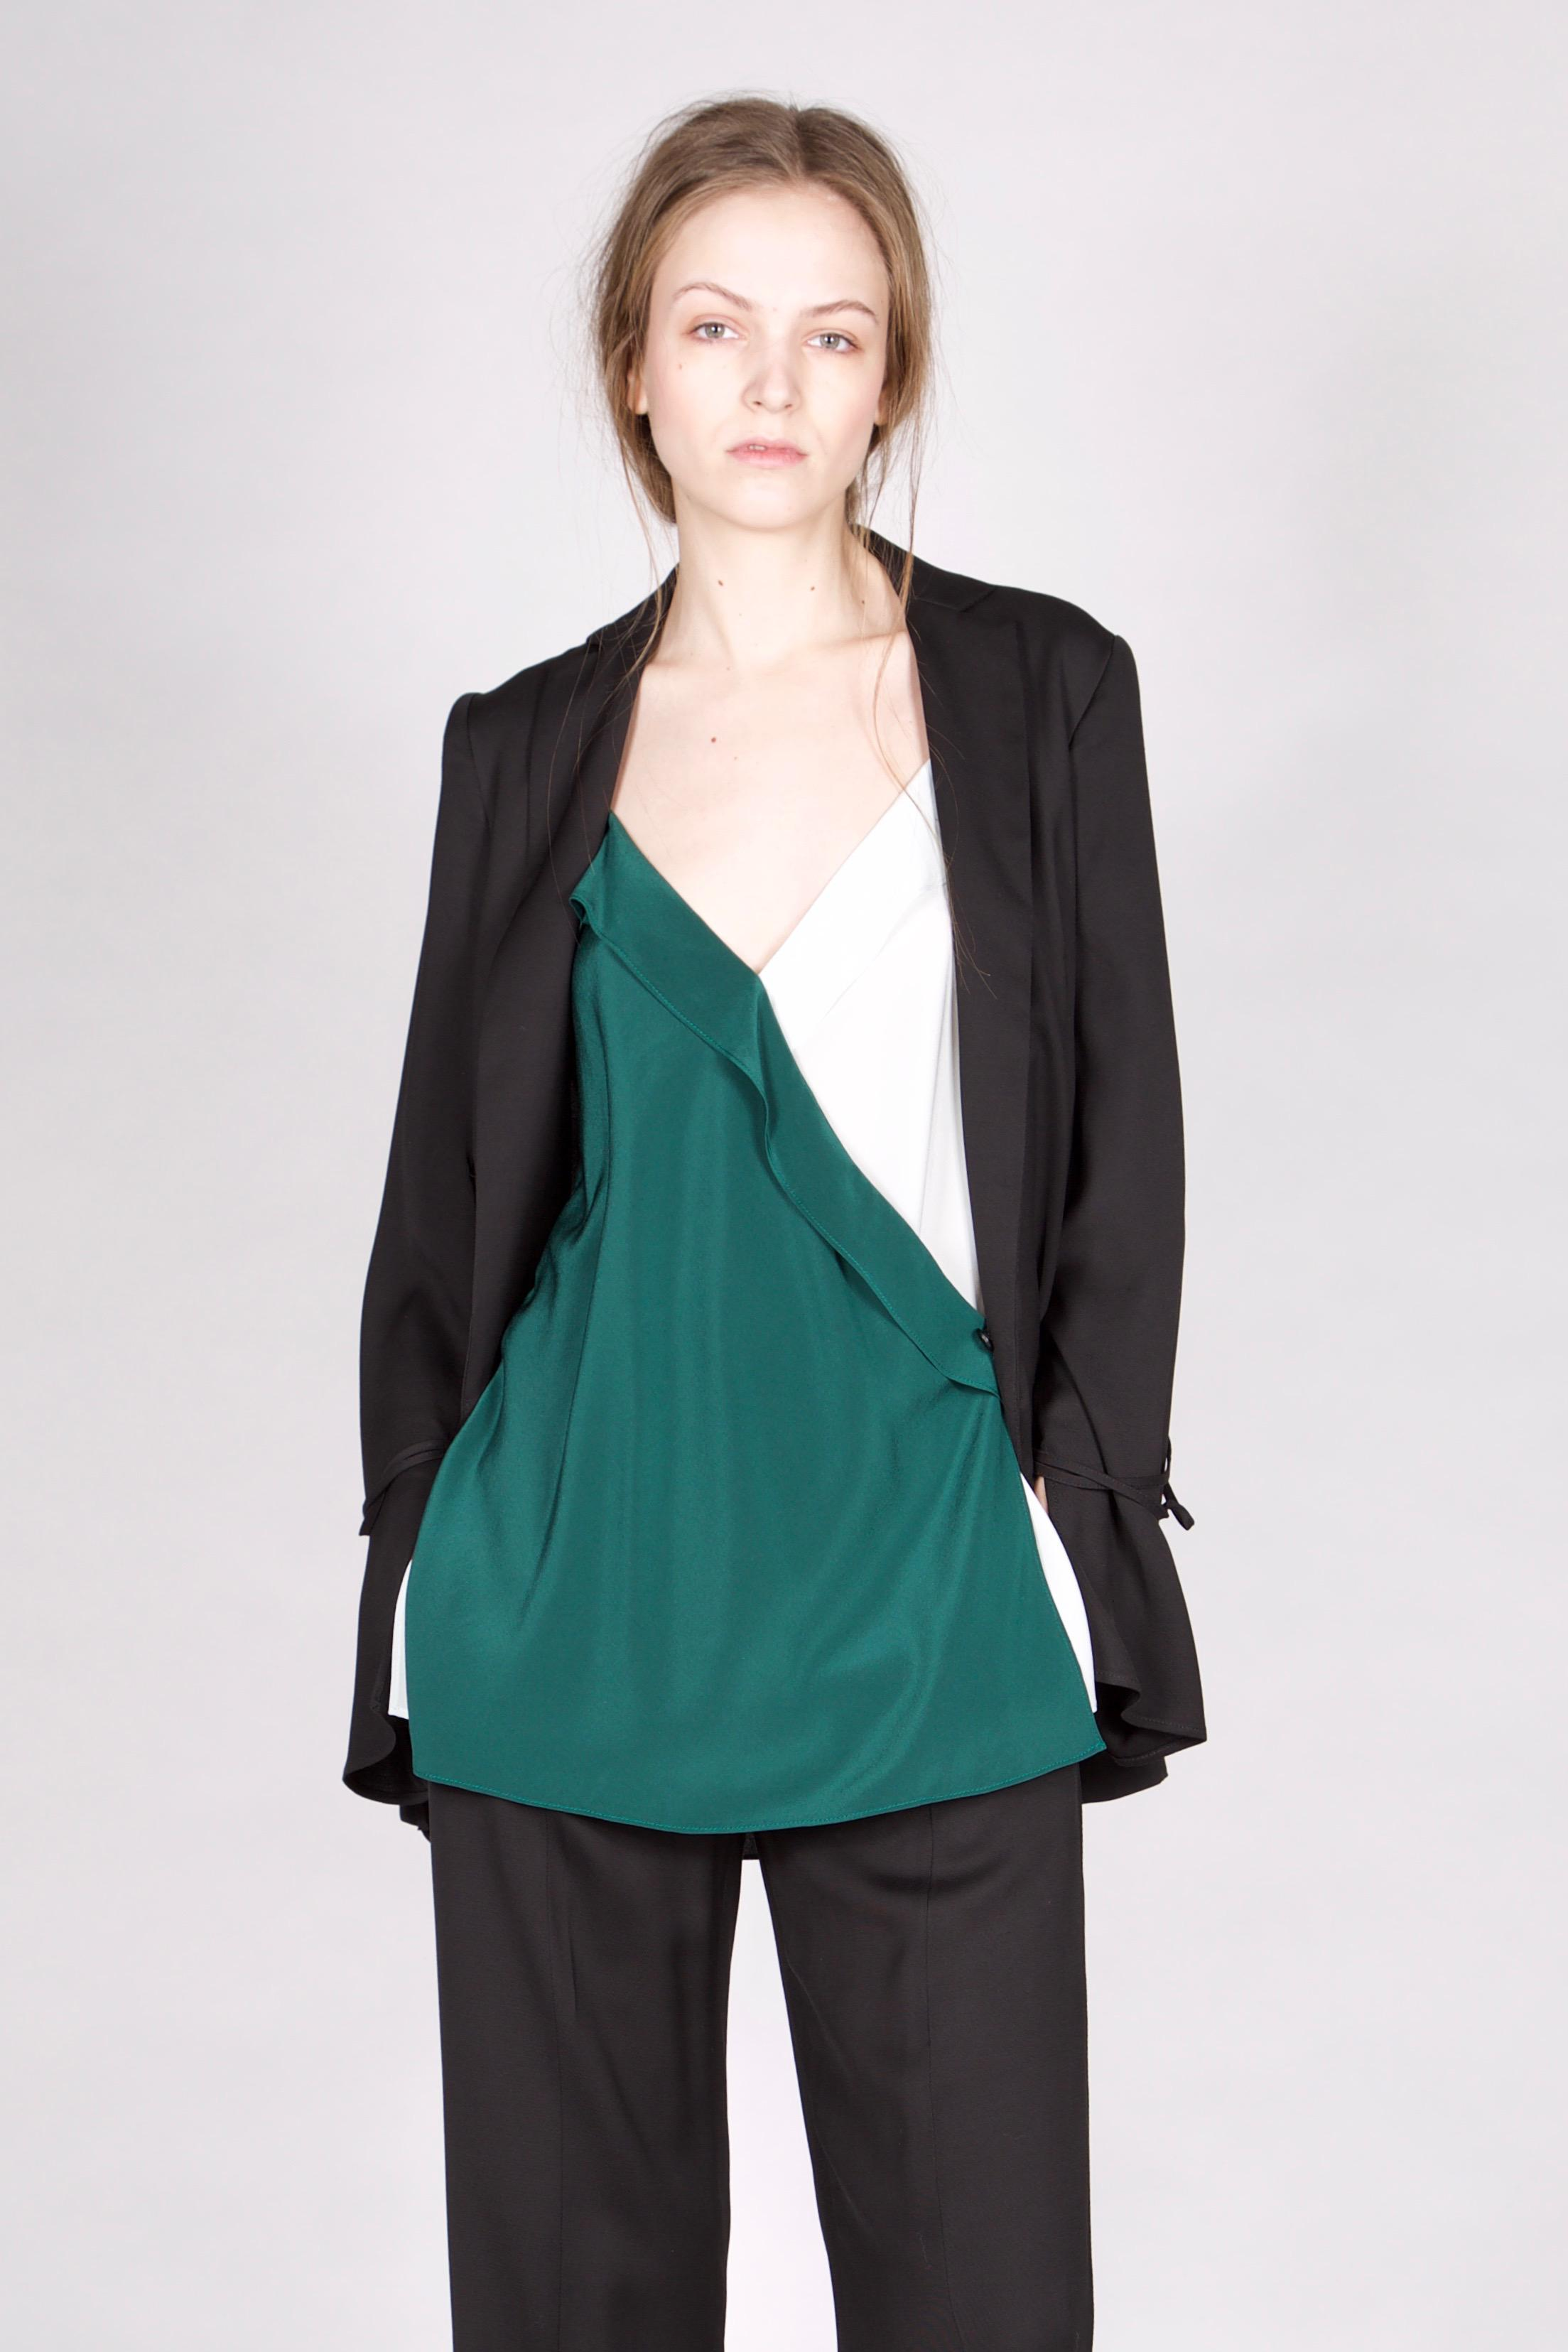 lyst dorothee schumacher dancing movement jacket sleeve 1 1 in black. Black Bedroom Furniture Sets. Home Design Ideas